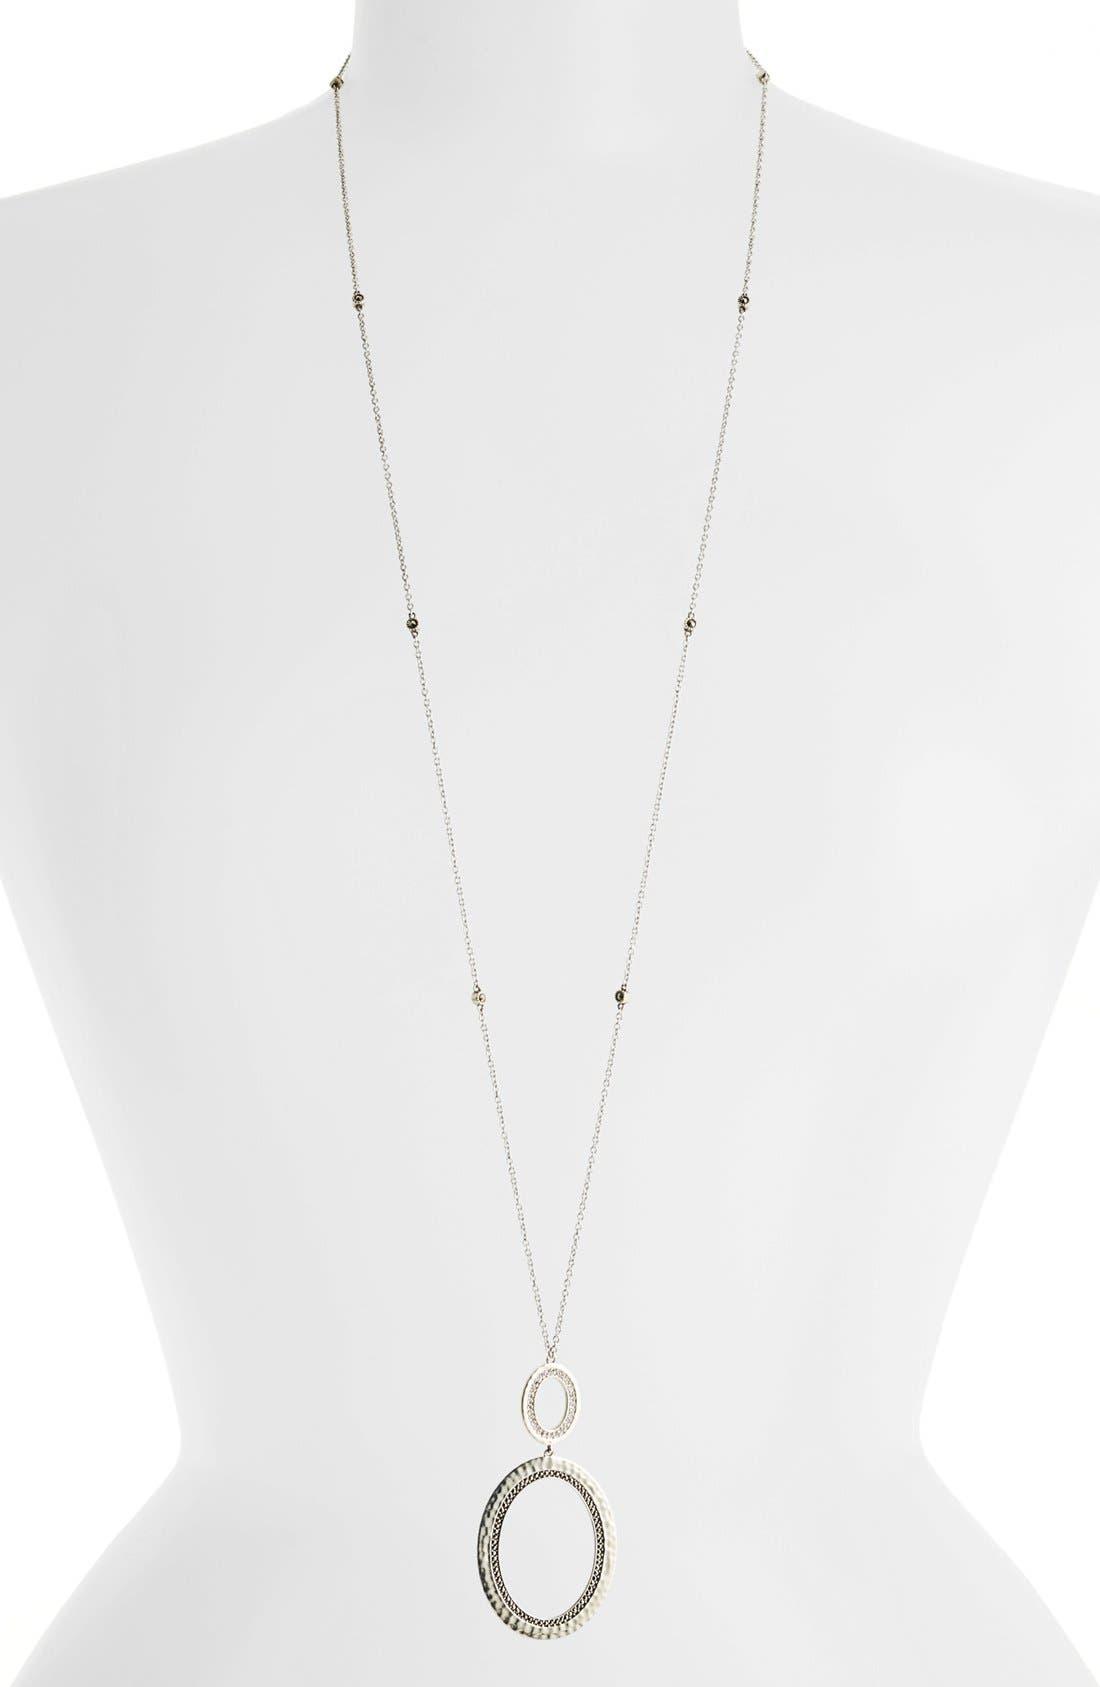 Main Image - Judith Jack 'Halo' Convertible Pendant Necklace